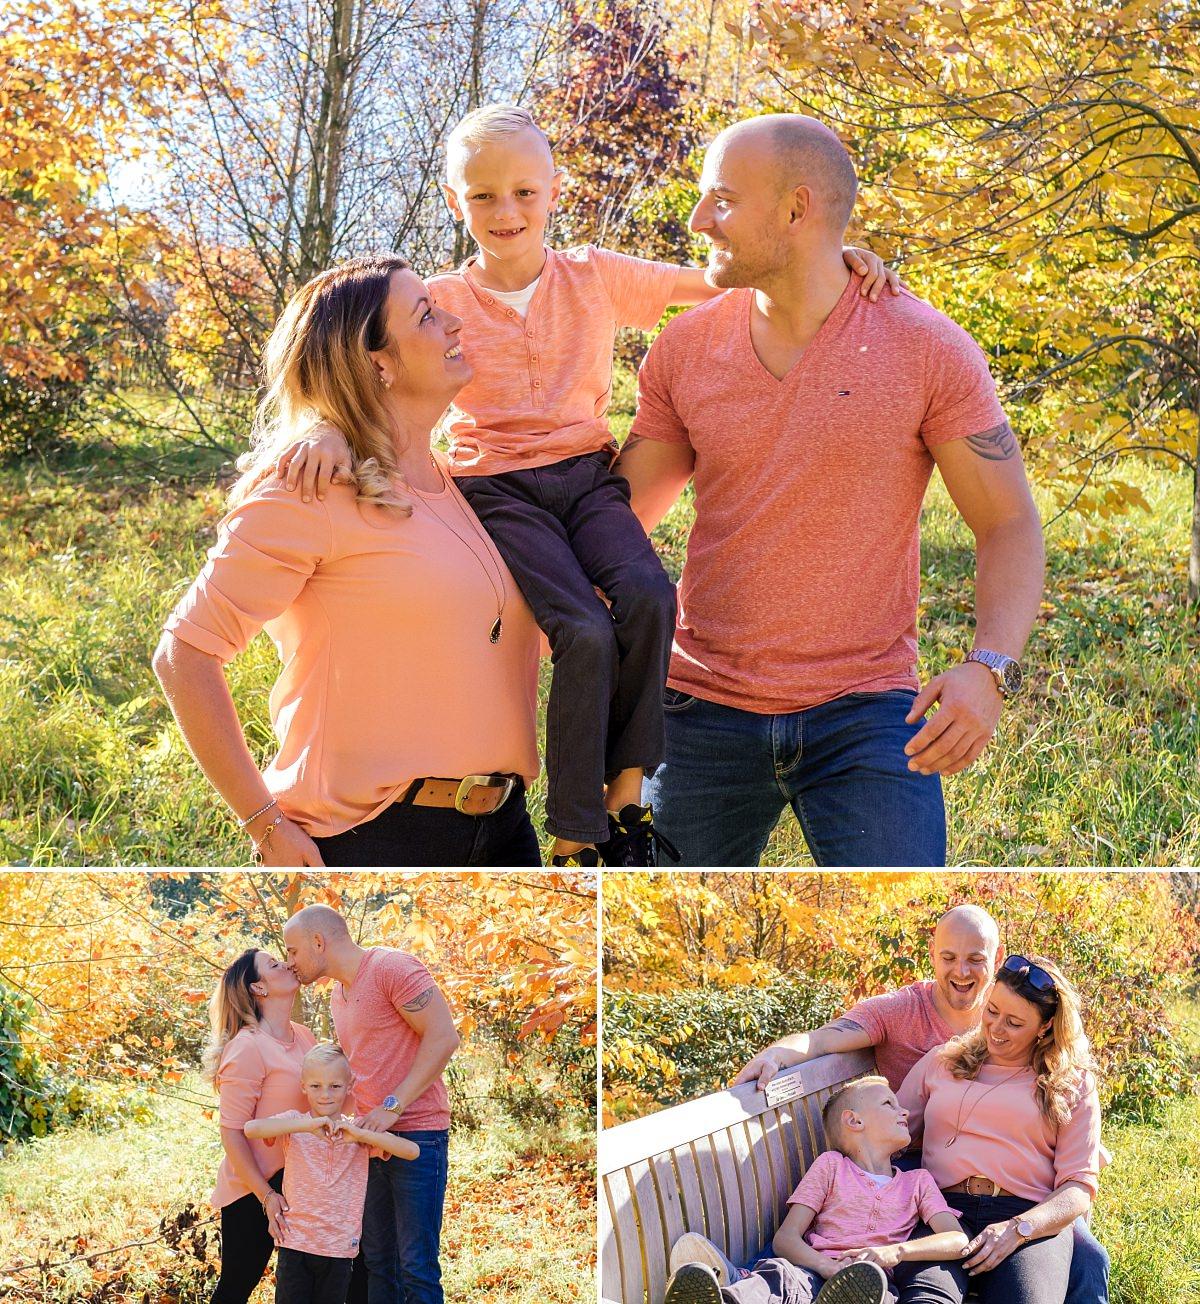 Familienfotos Dresden Herbst Spaziergang Familie auf Bank